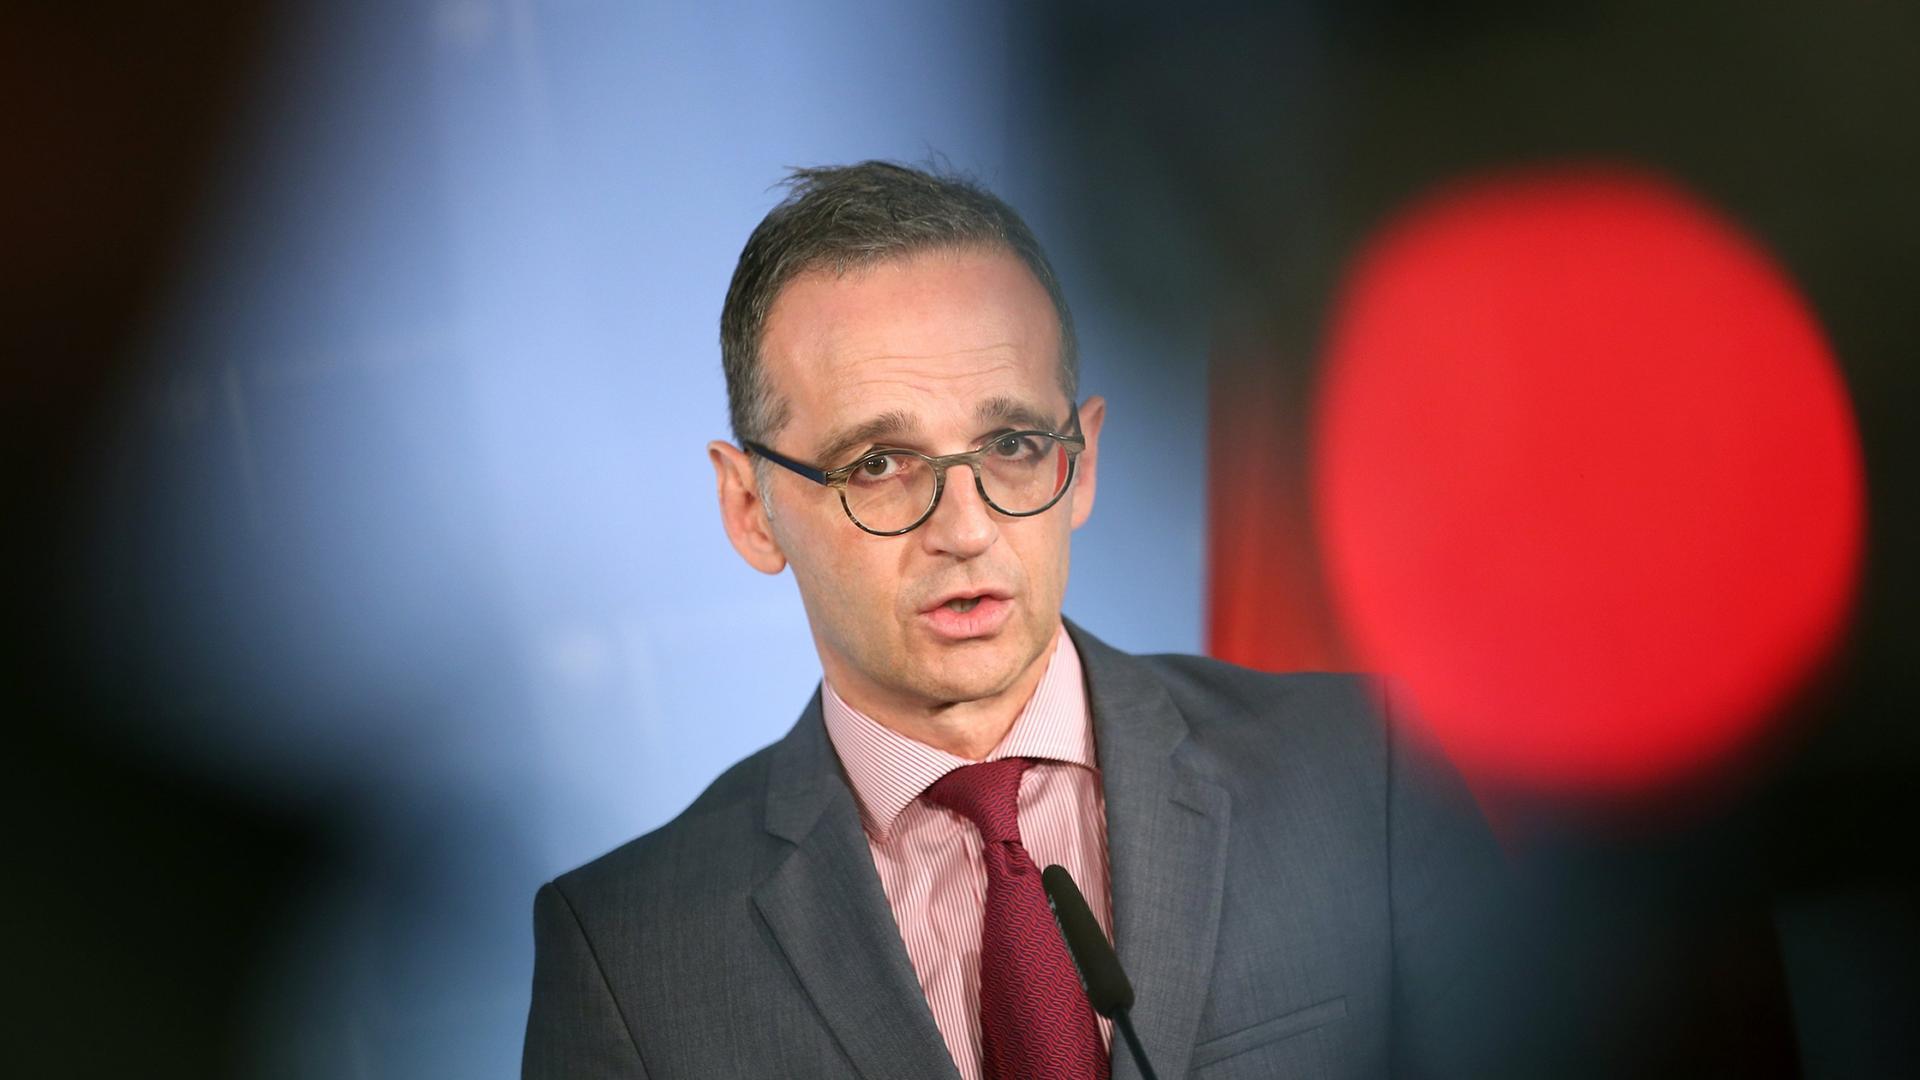 Warnung Vor Panikmache Maas Mahnt In Migrationsdebatte Zdfmediathek